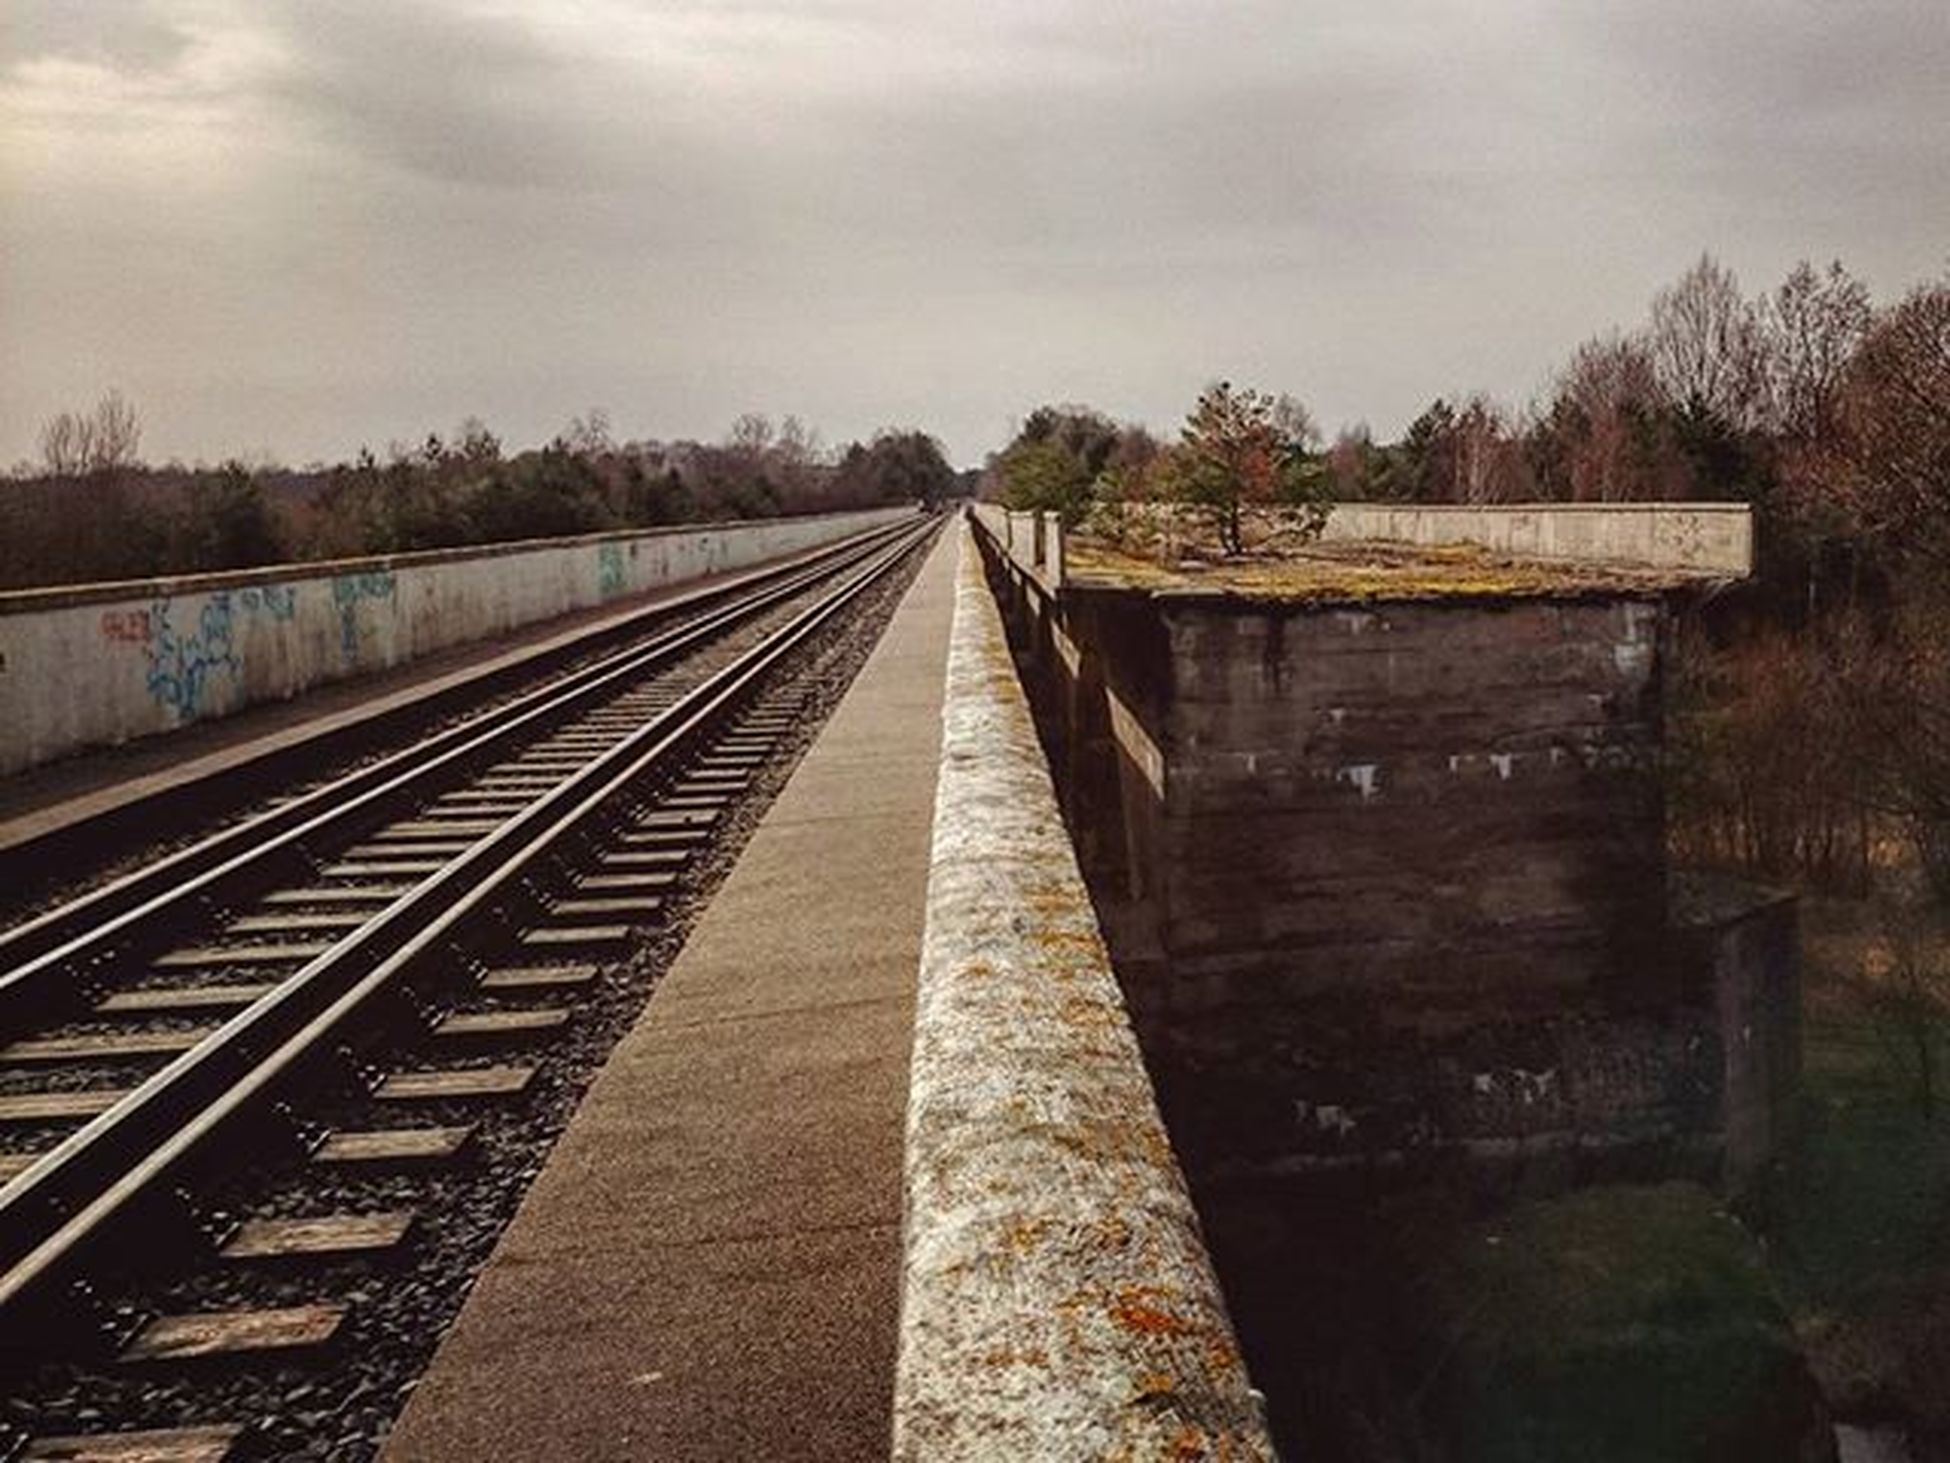 🌉 Pstrąże Most Tory Opuszczone Poligon Rzeka Bóbr Bridge Railway Abandoned Traverse River Urbex Urbanexploration